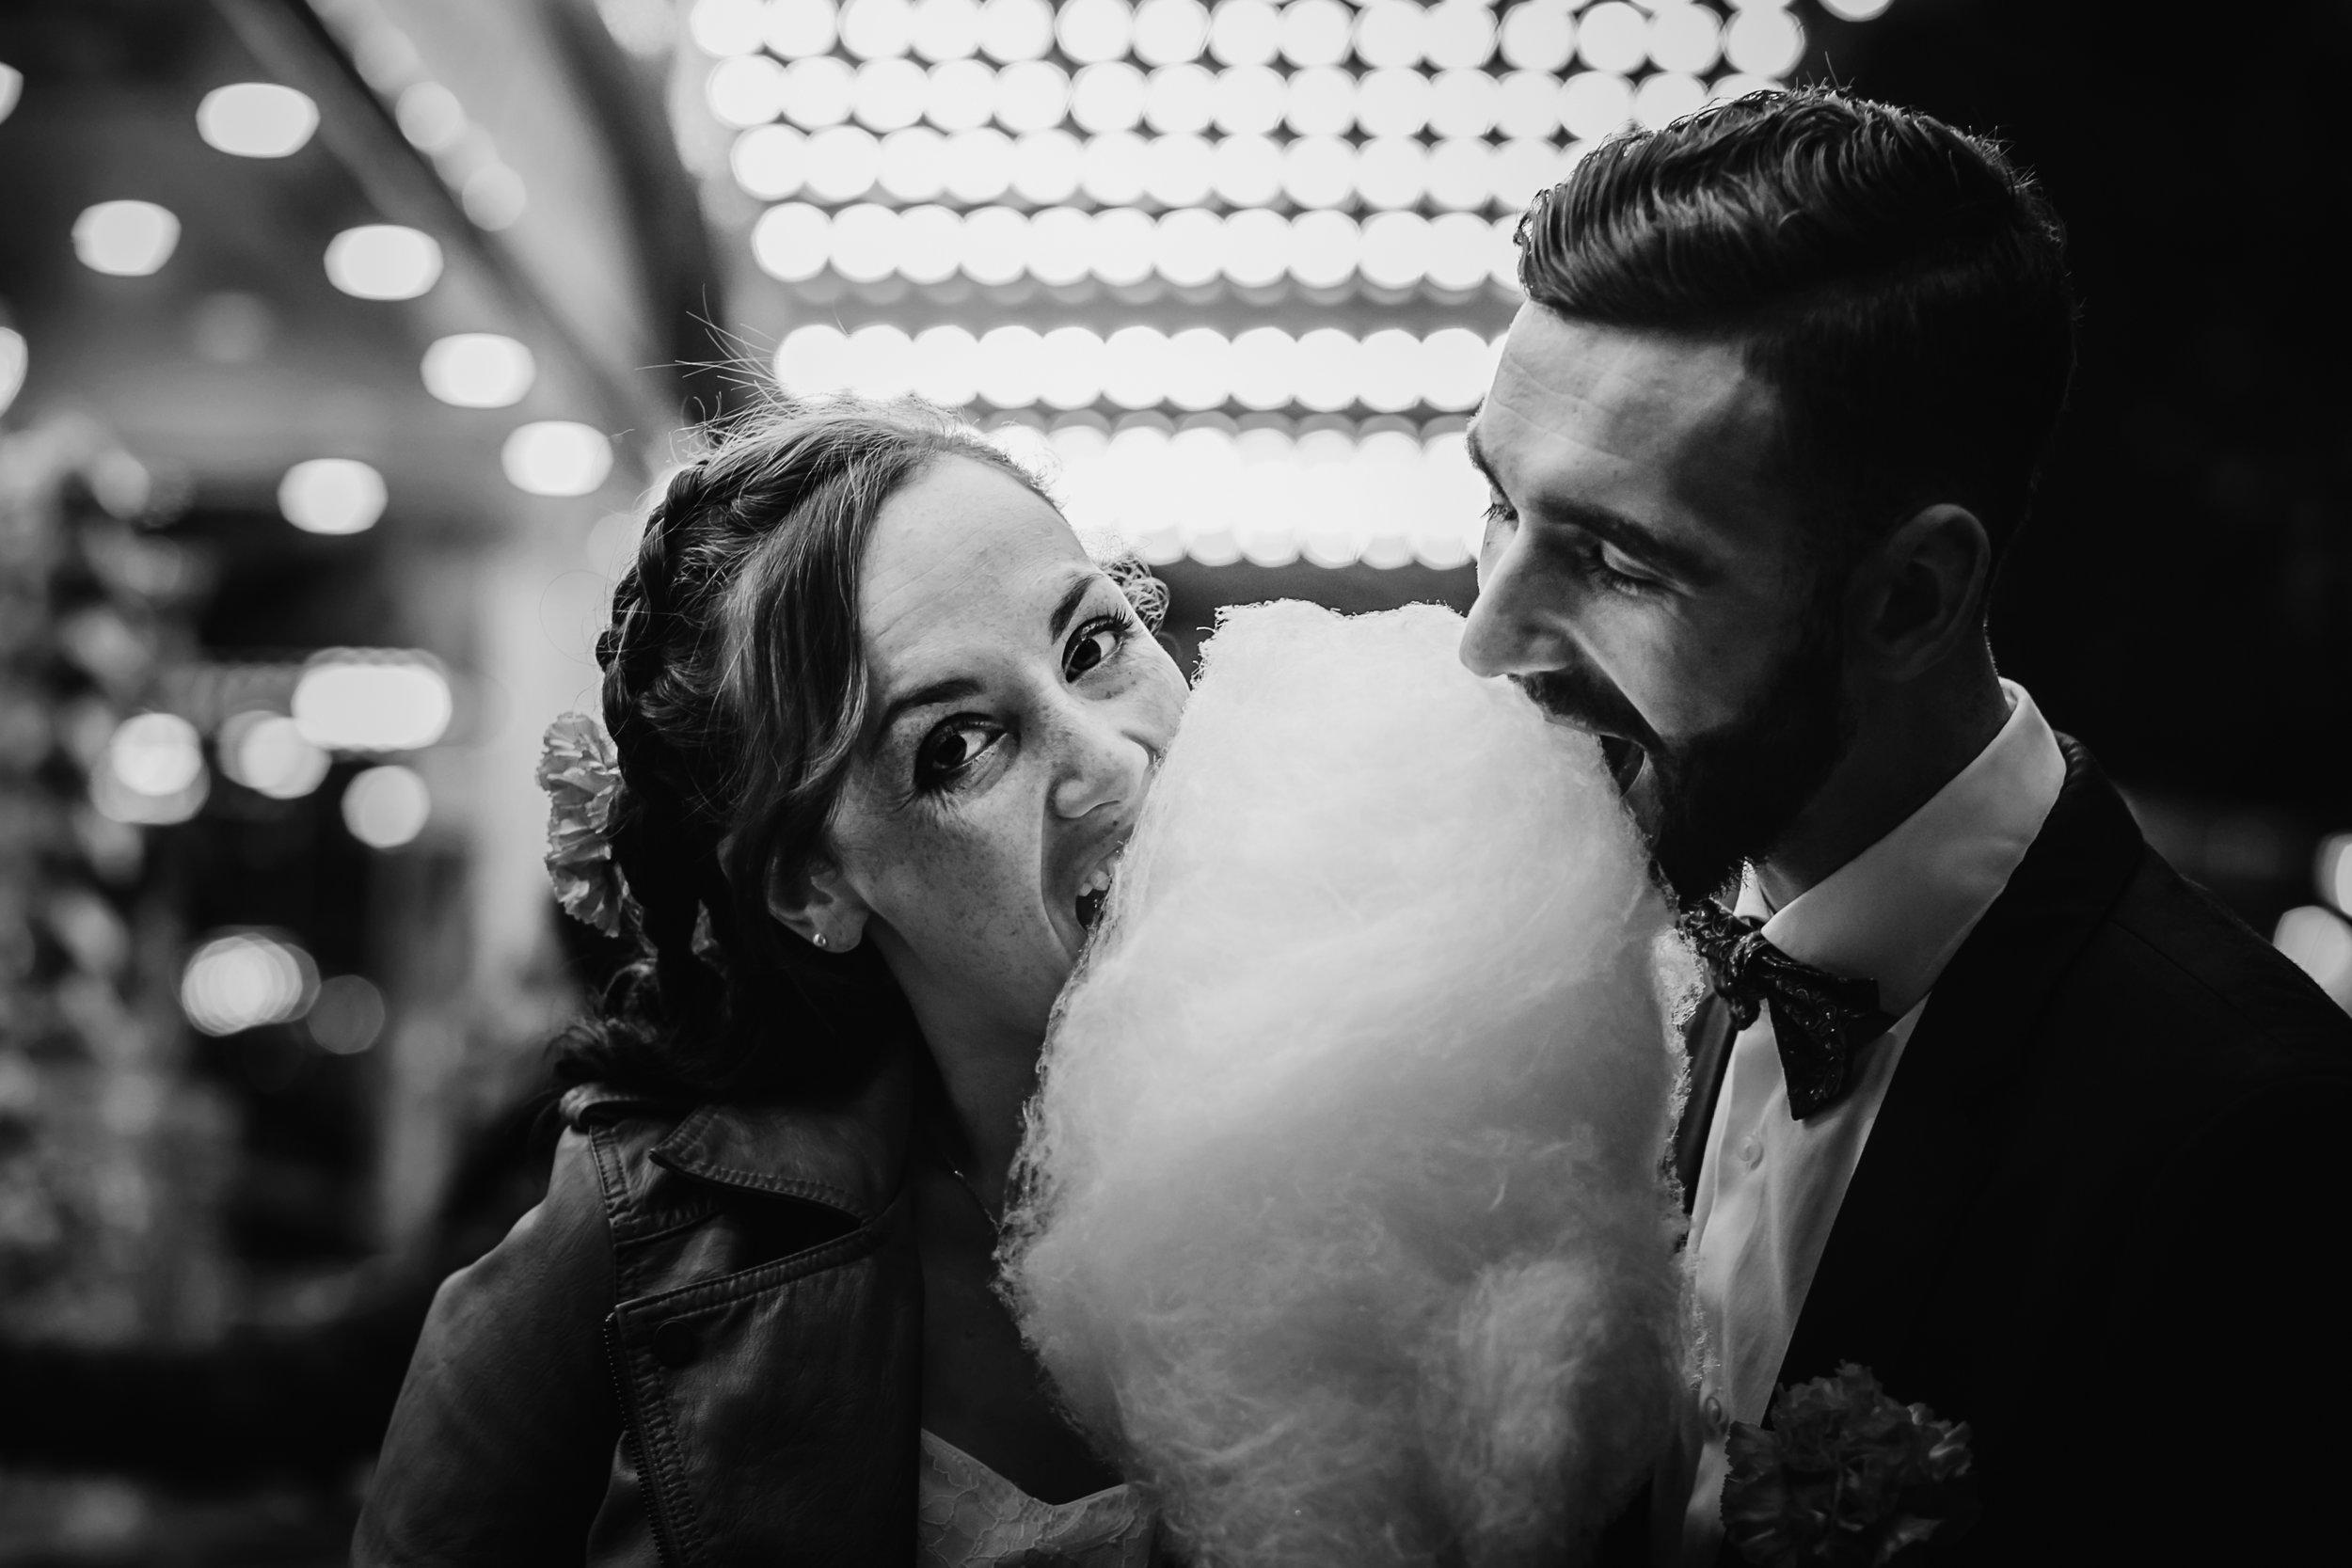 couple-vogue-lyon-ingold-photographe-29.jpg